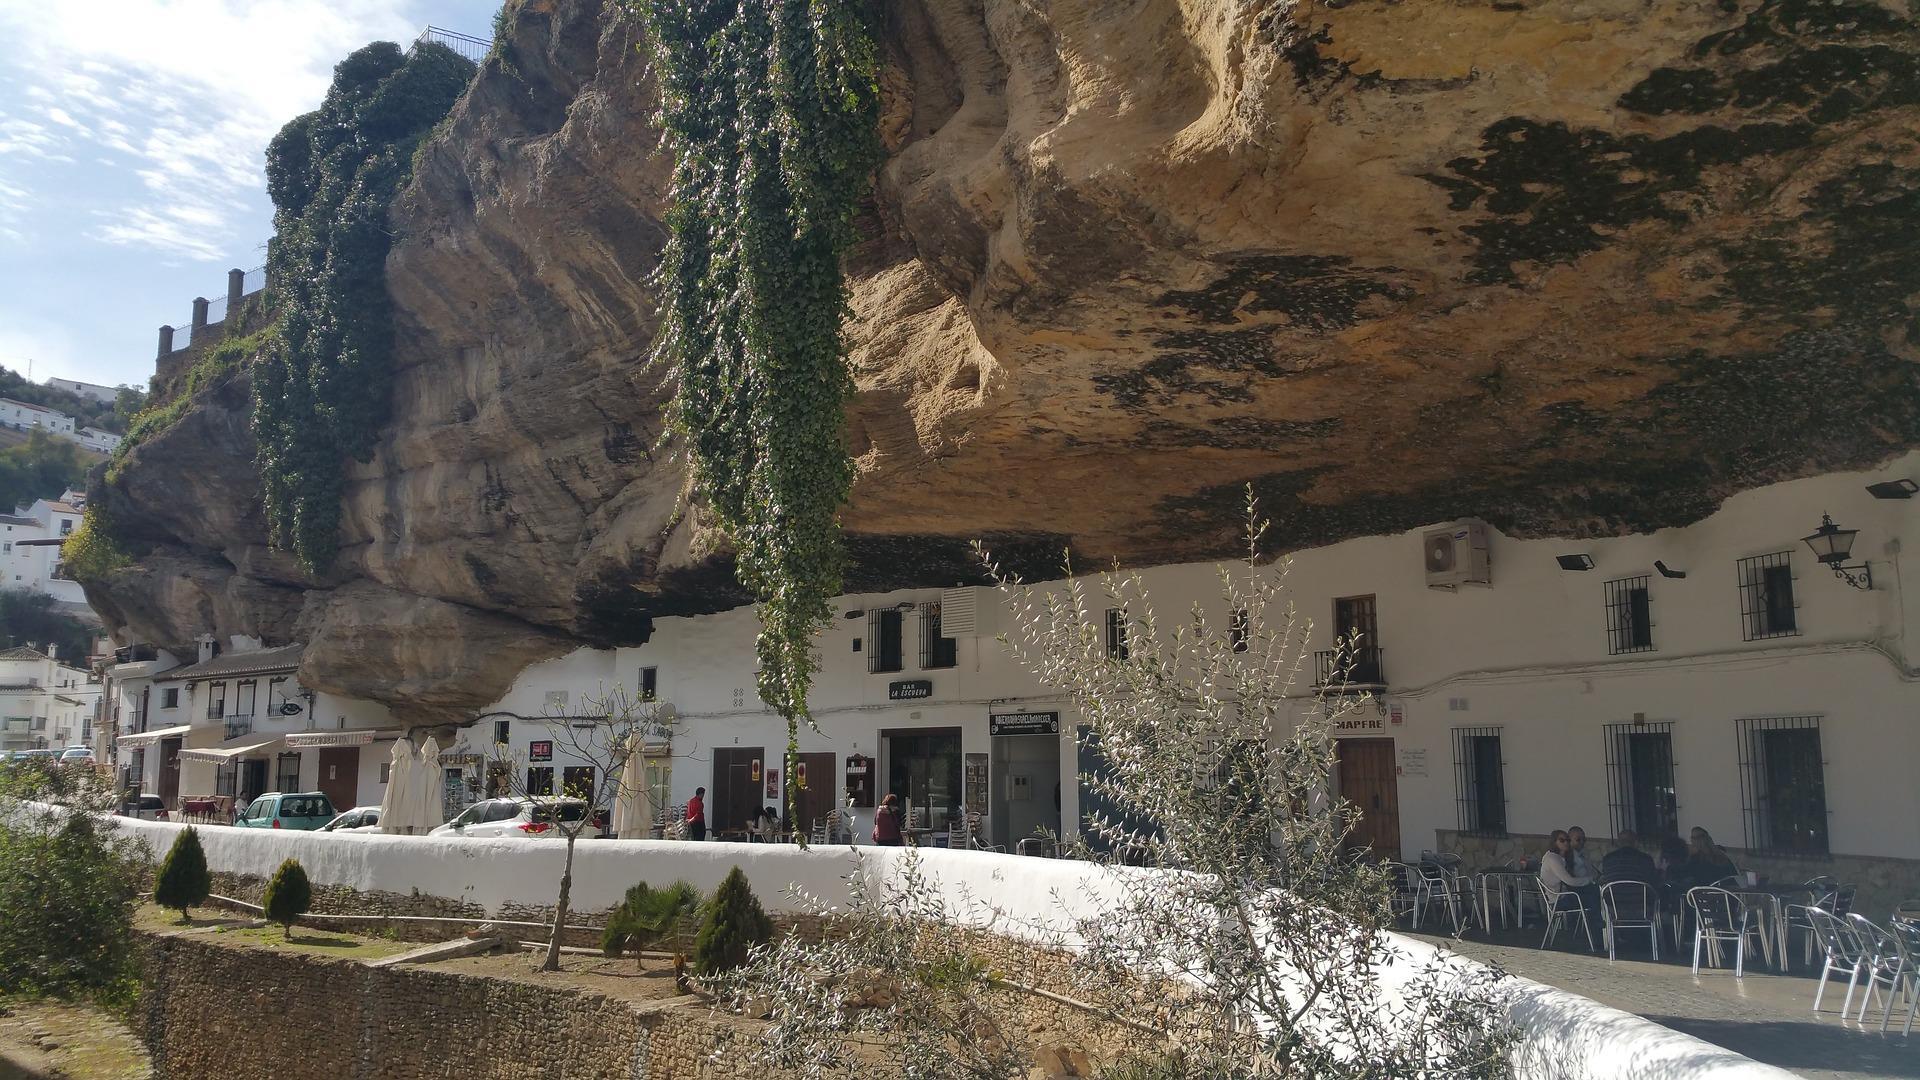 Guided Tour of Setenil de las Bodegas